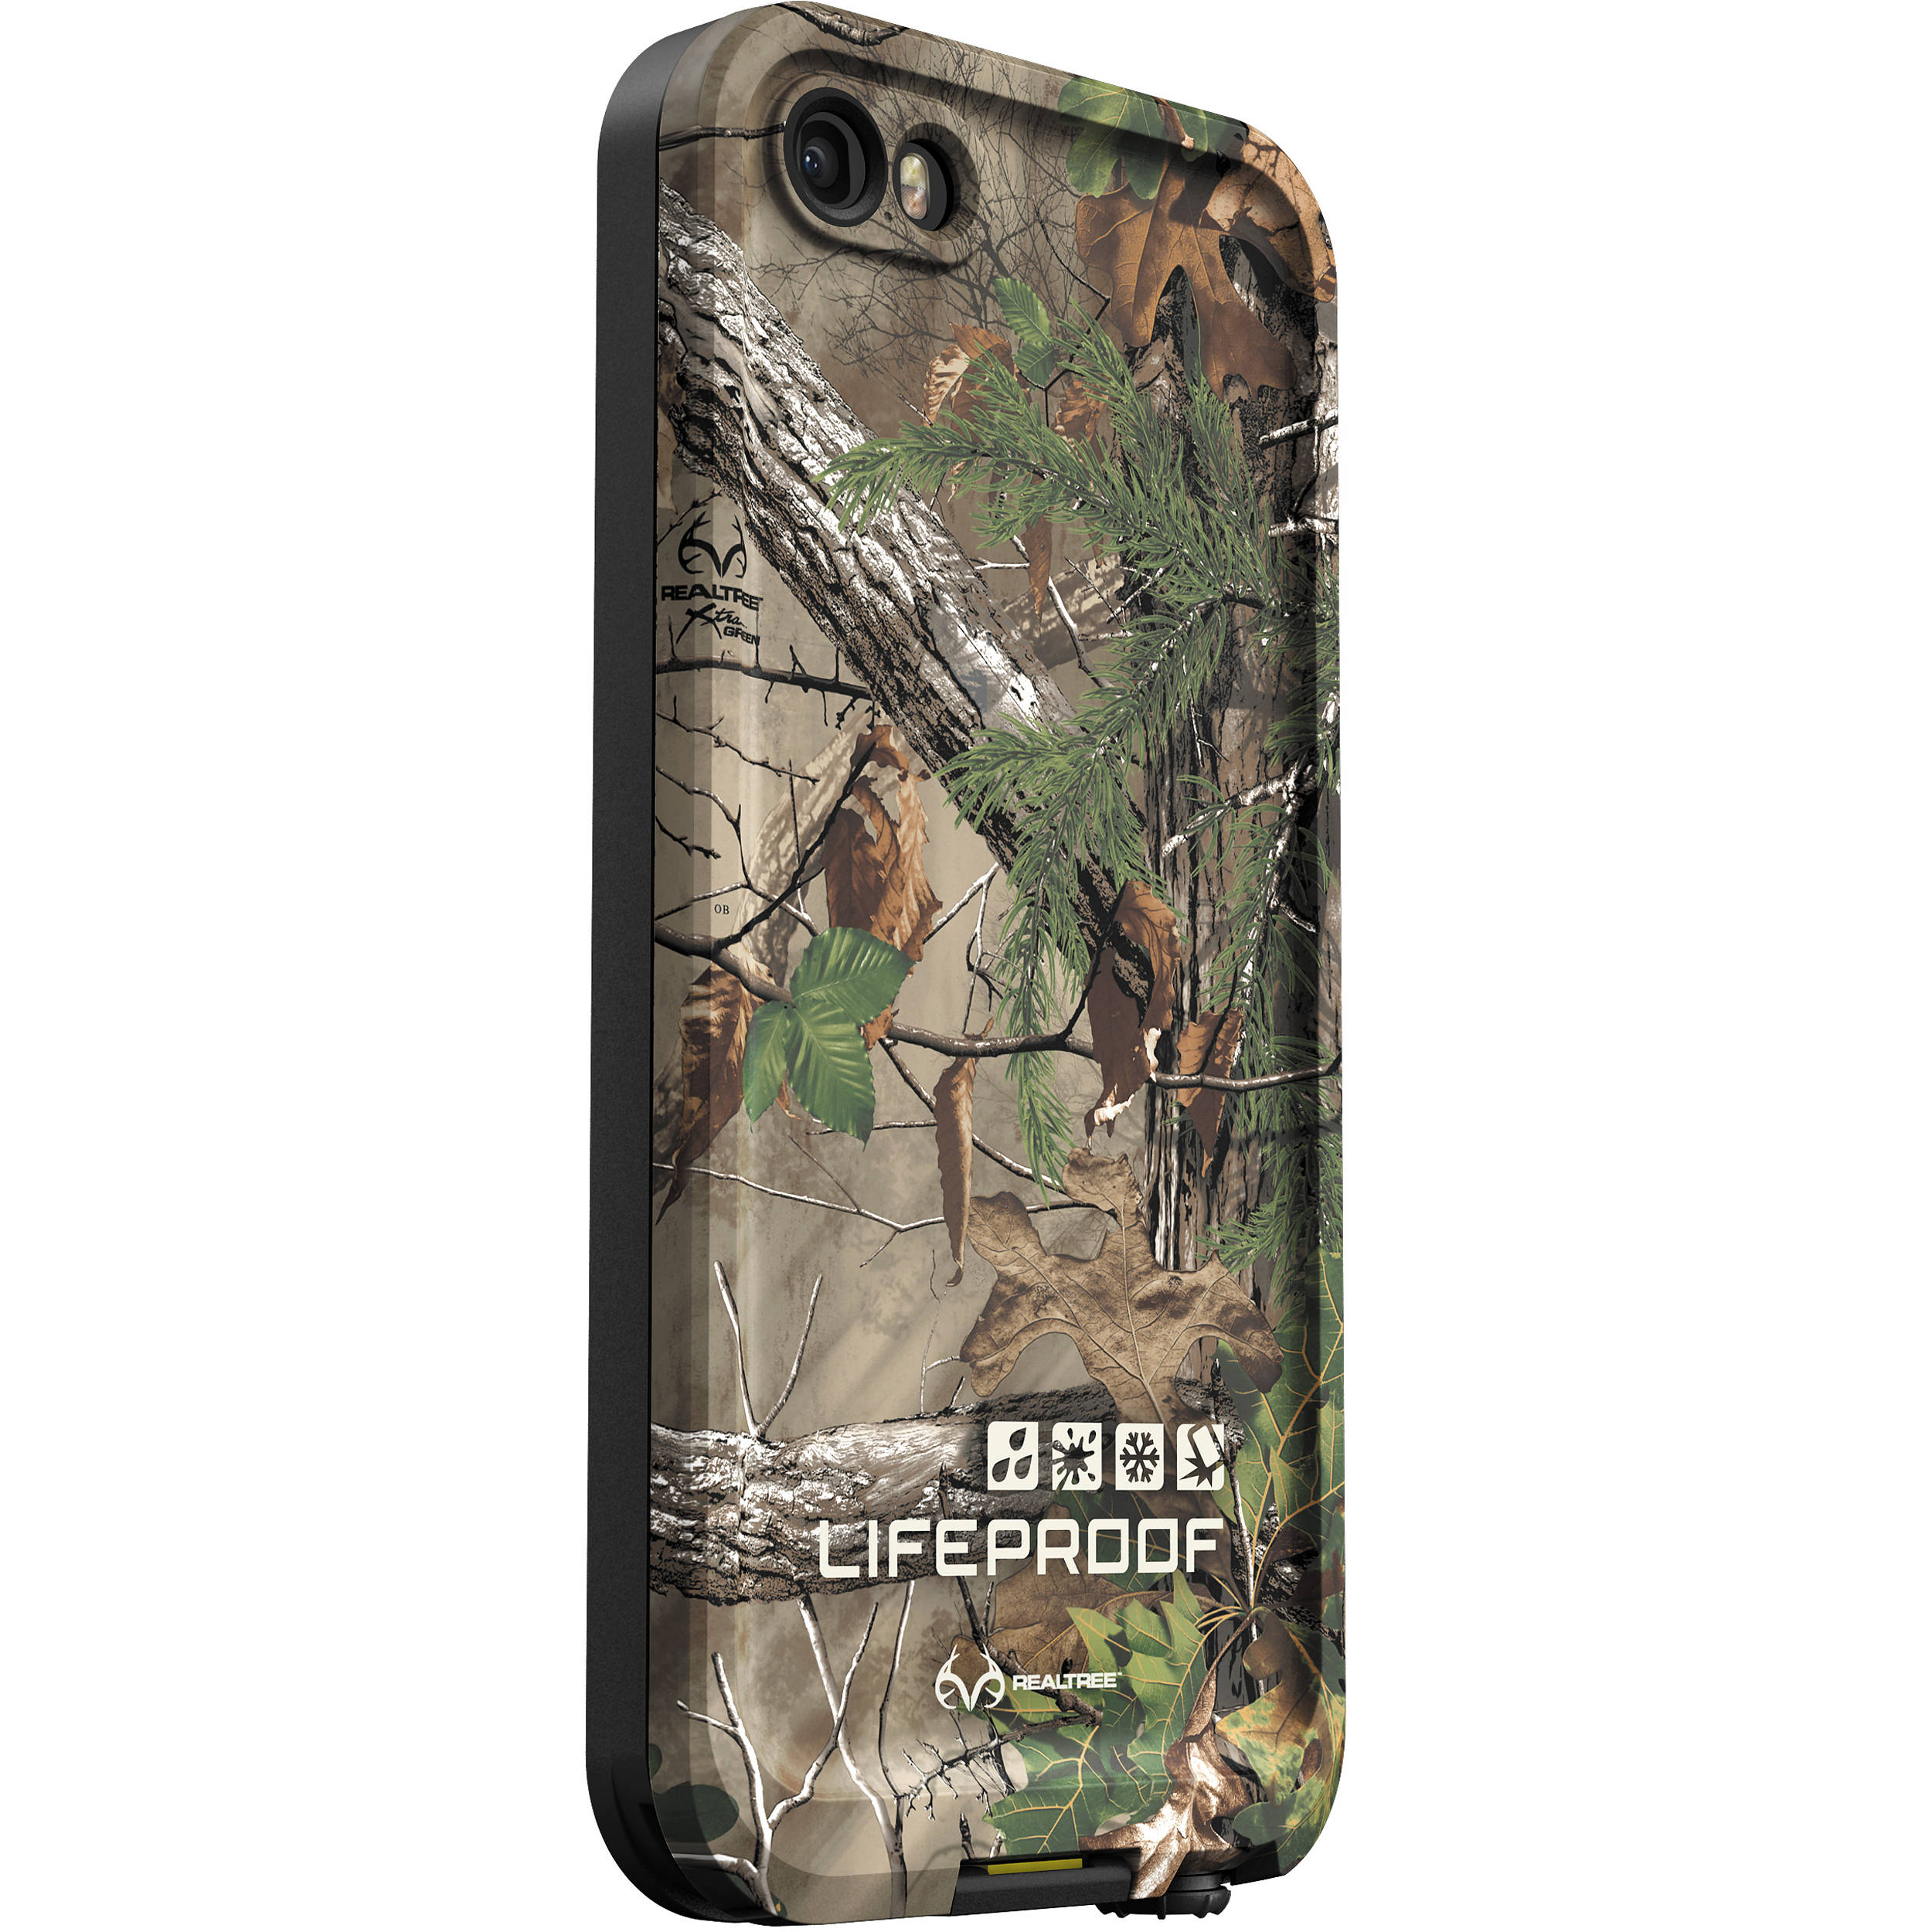 LifeProof fr  275  Case for iPhone 5 5s SE (Olive Drab. LifeProof fr  33ba910e78fb